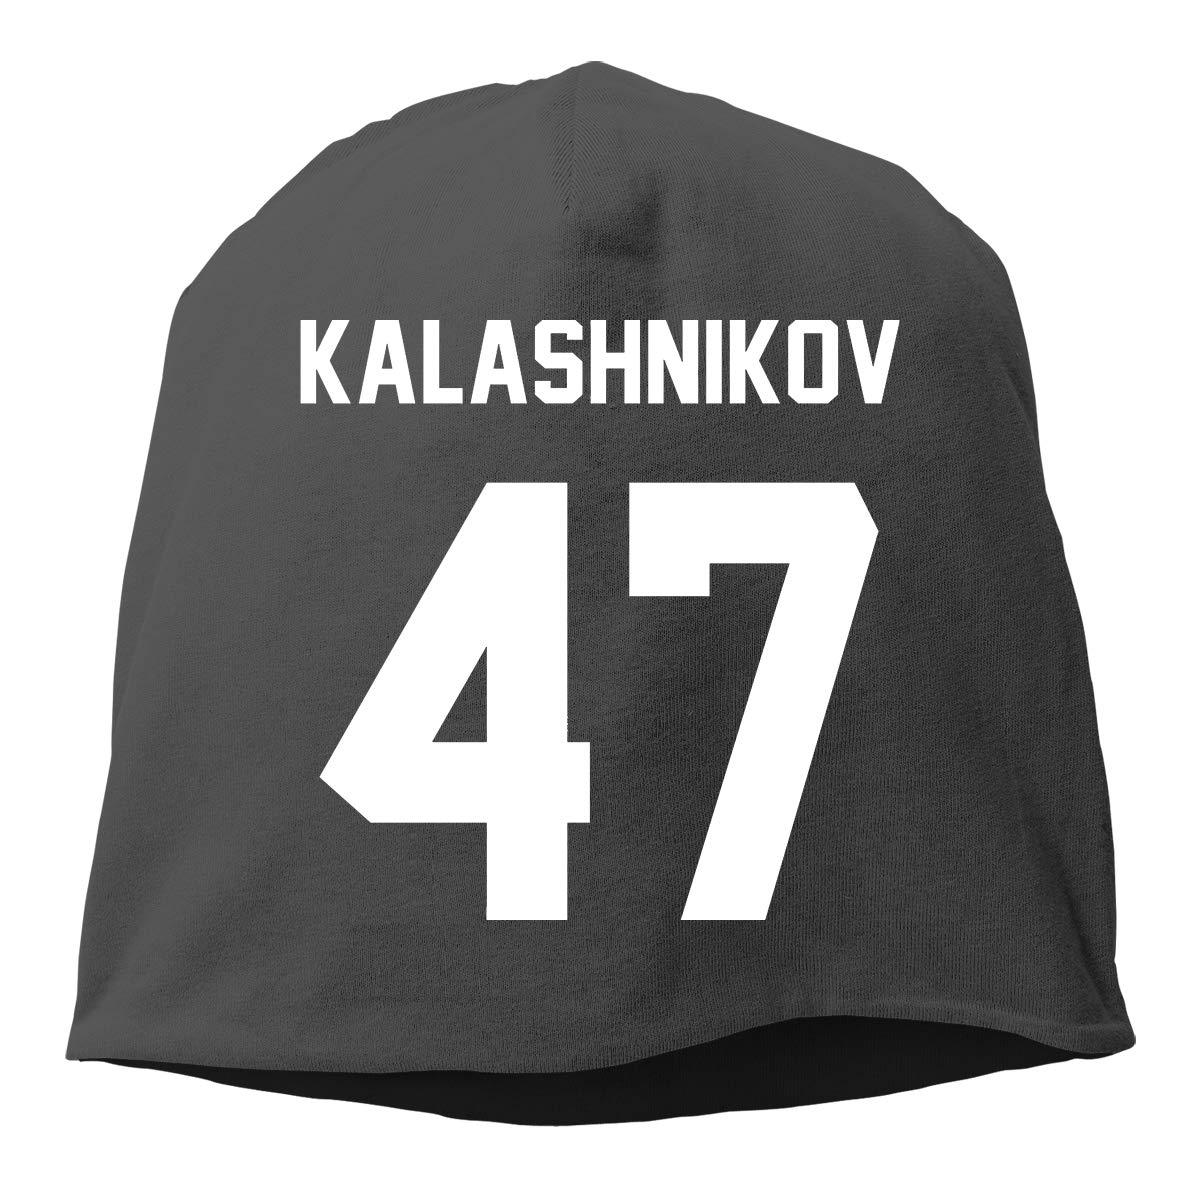 Kalashnikov 47 Unisex Knitted Hat Beanie Hat Warm Hats Skull Cap